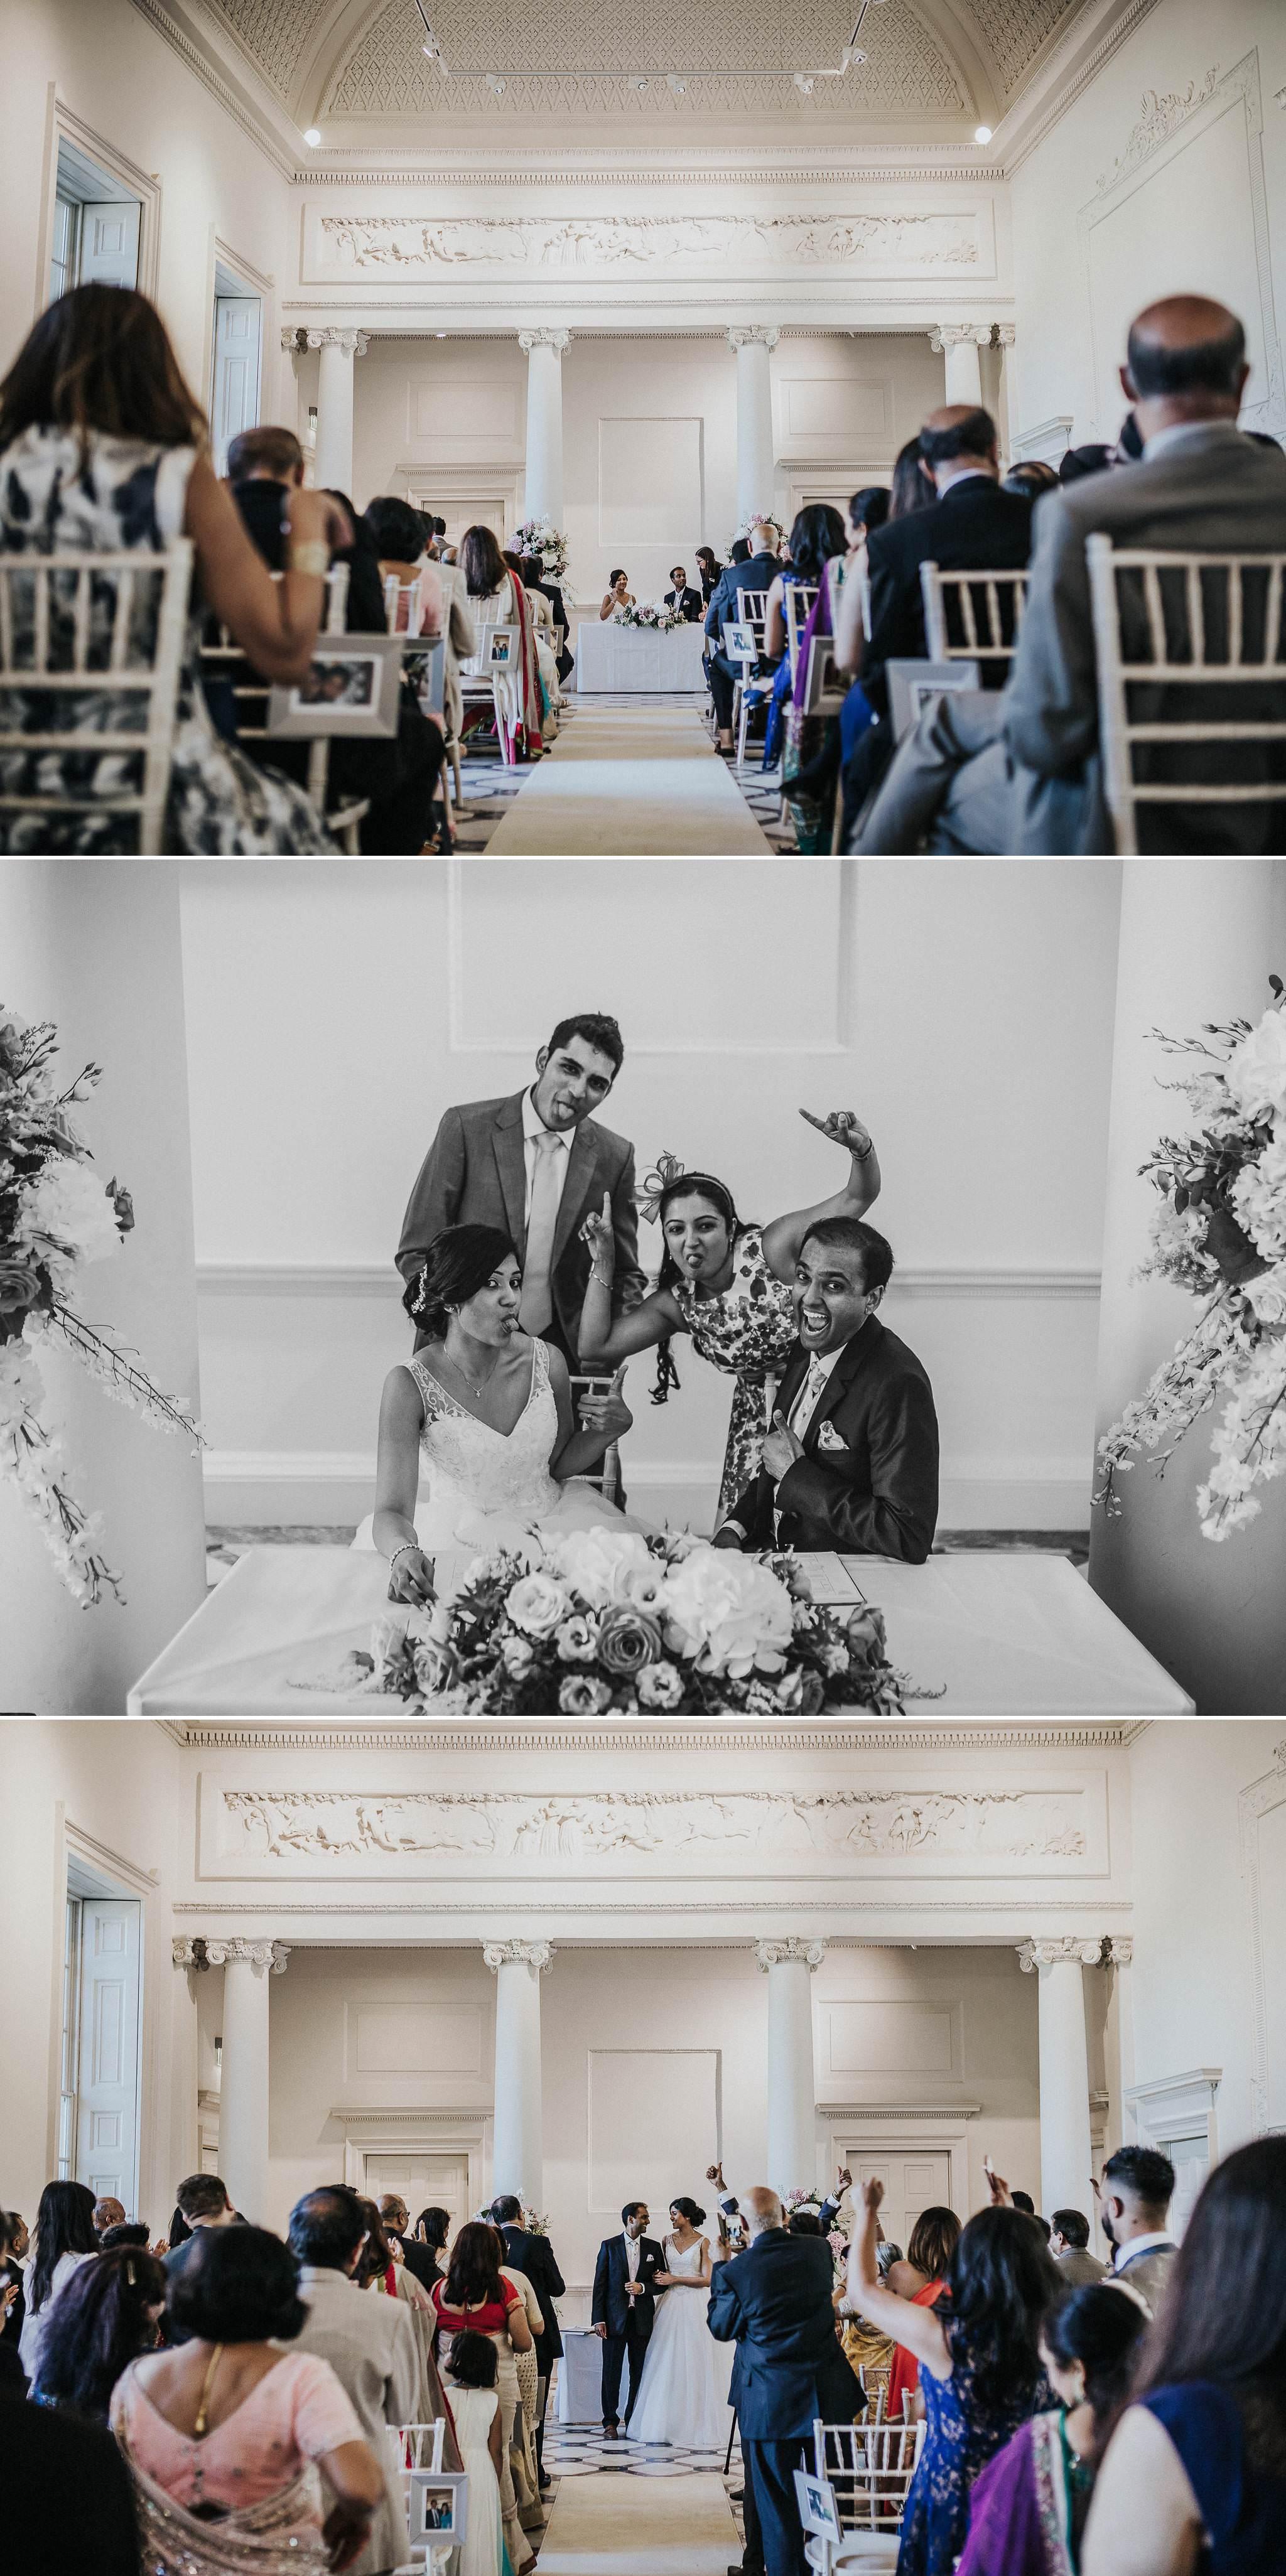 compton-verney-wedding-photos 16.jpg